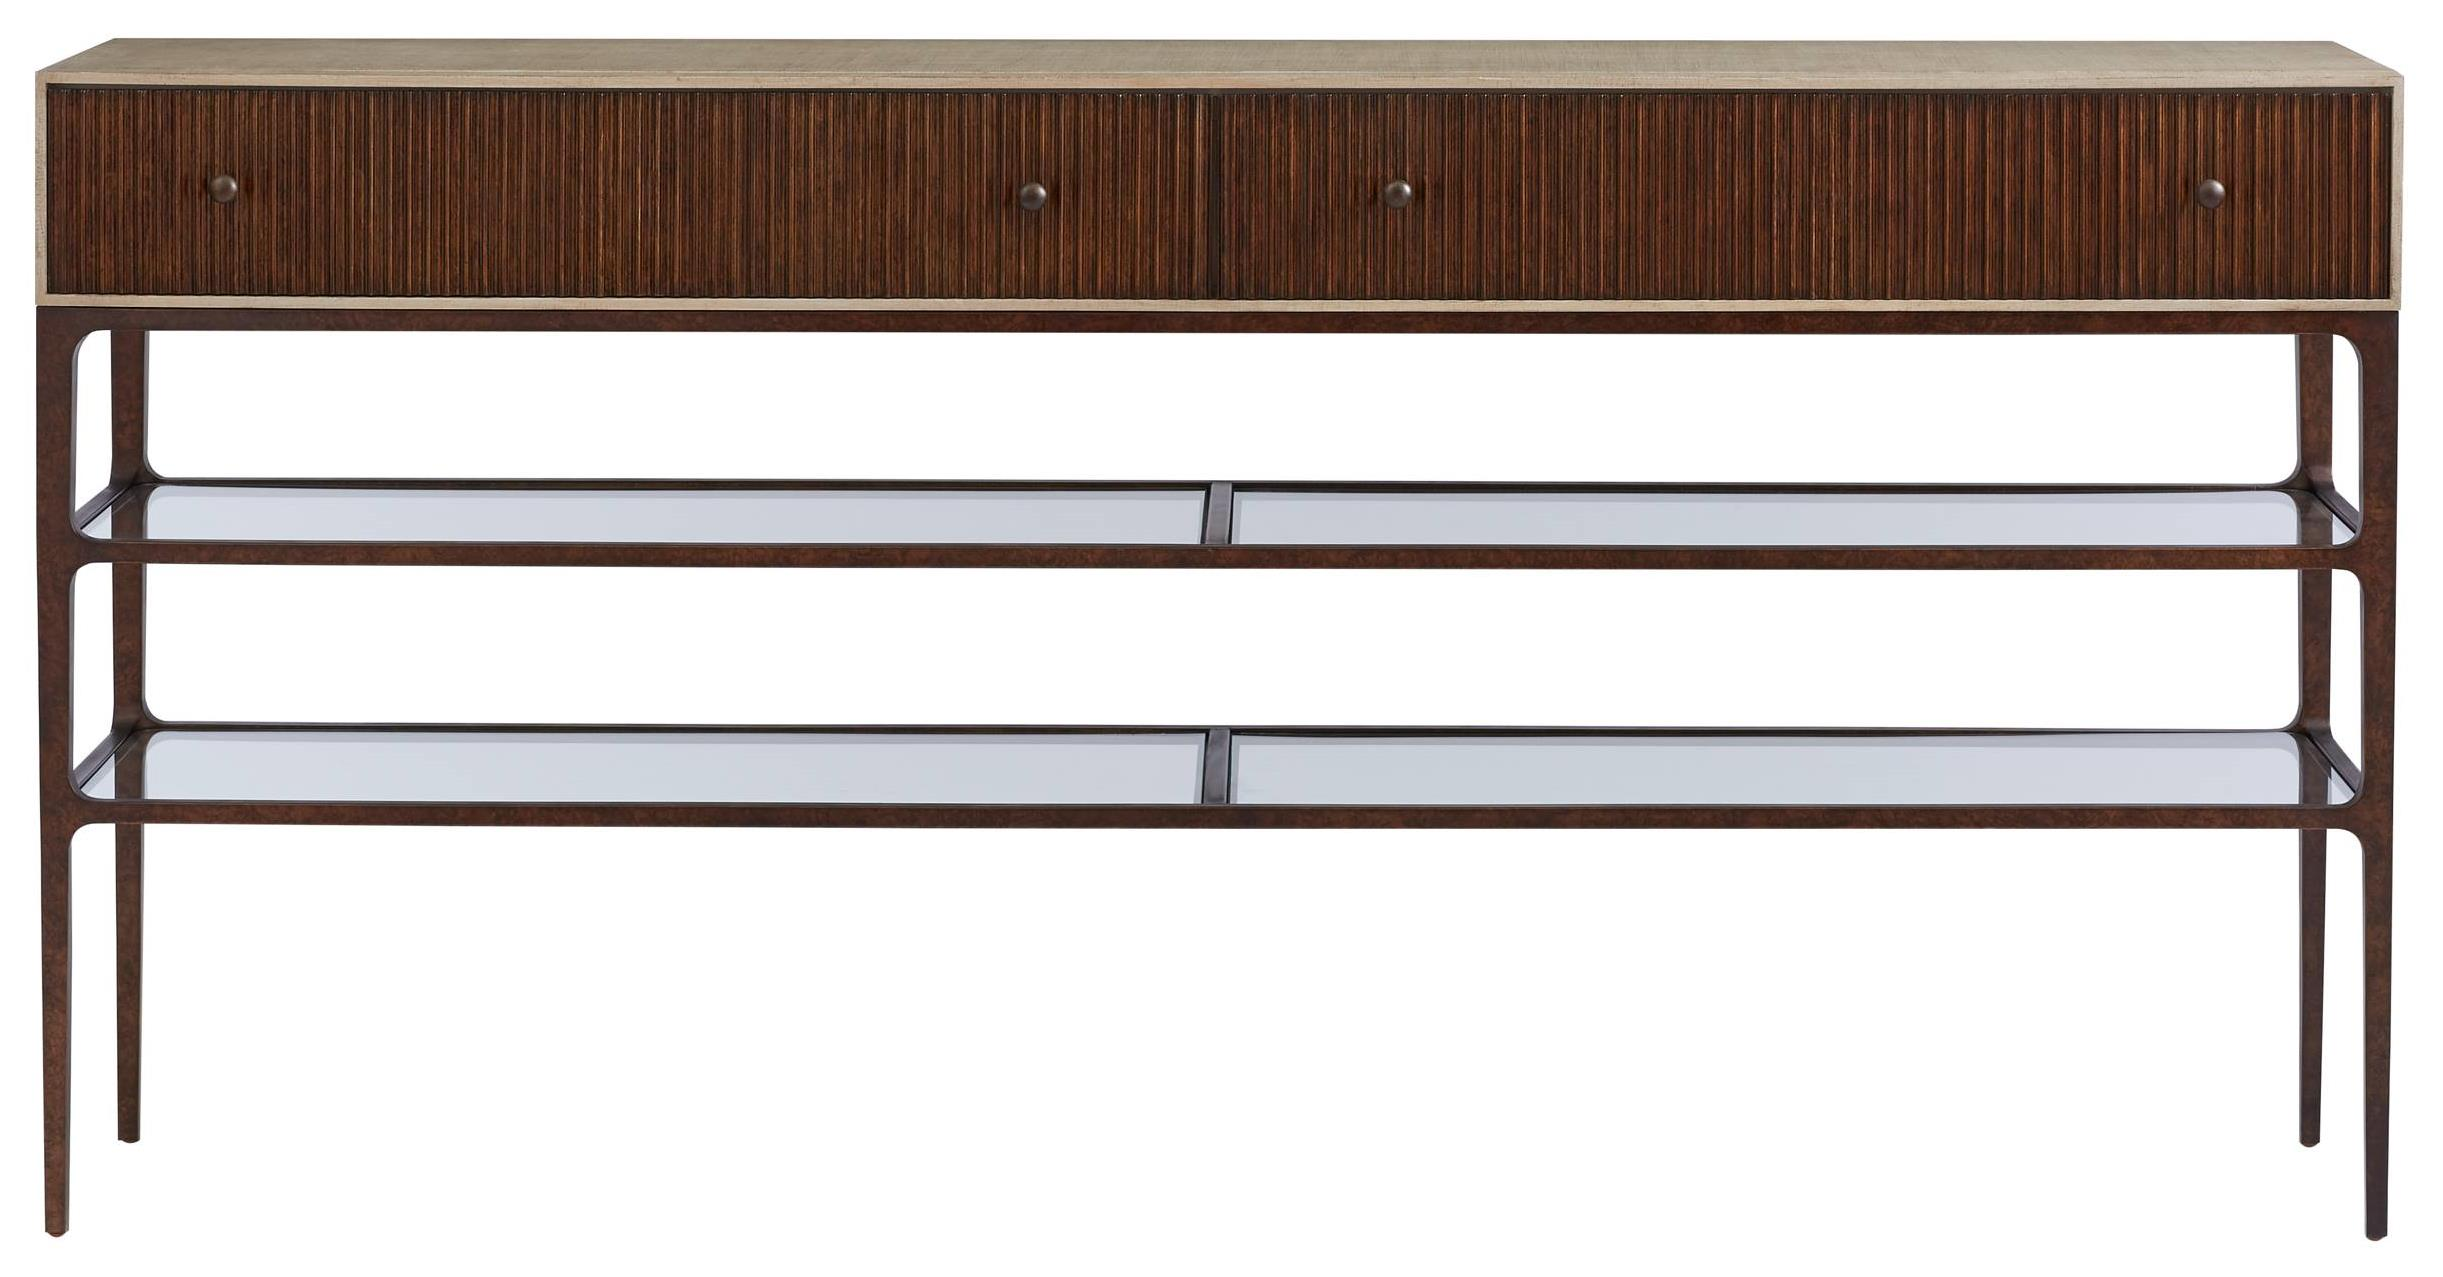 Stanley Furniture Villa Couture Serena Sideboard - Item Number: 510-21-06